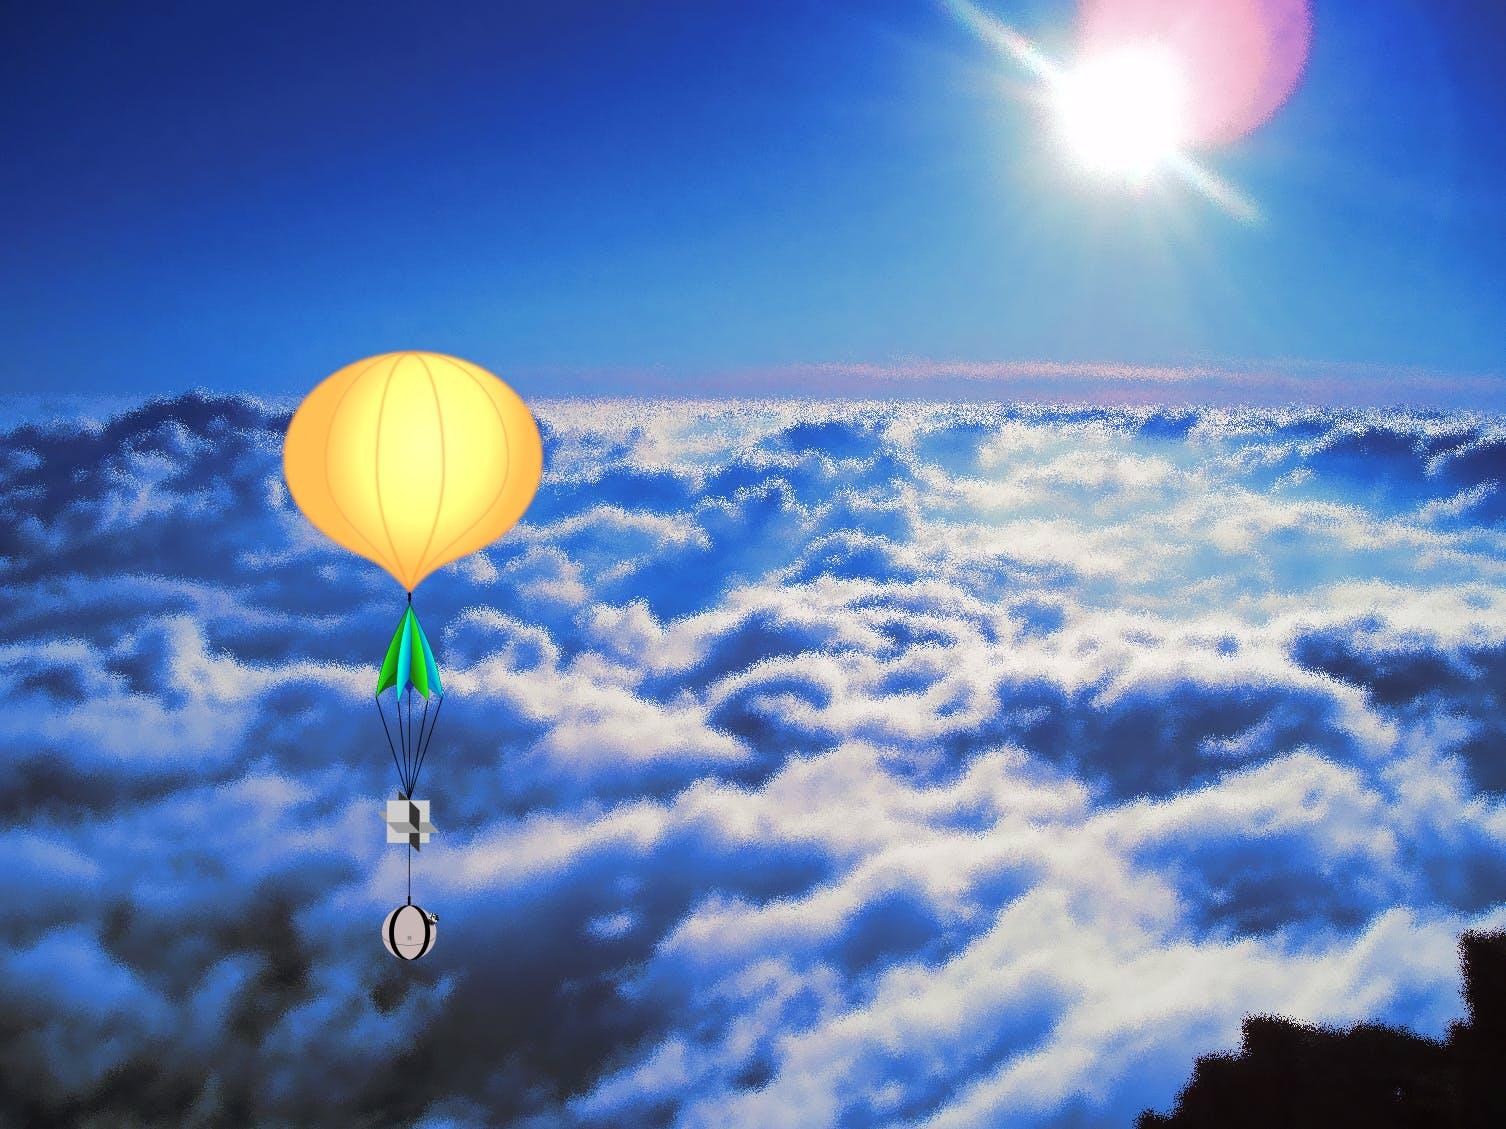 Mission S-09 Mk1 - High Altitude Environmental Ballooning